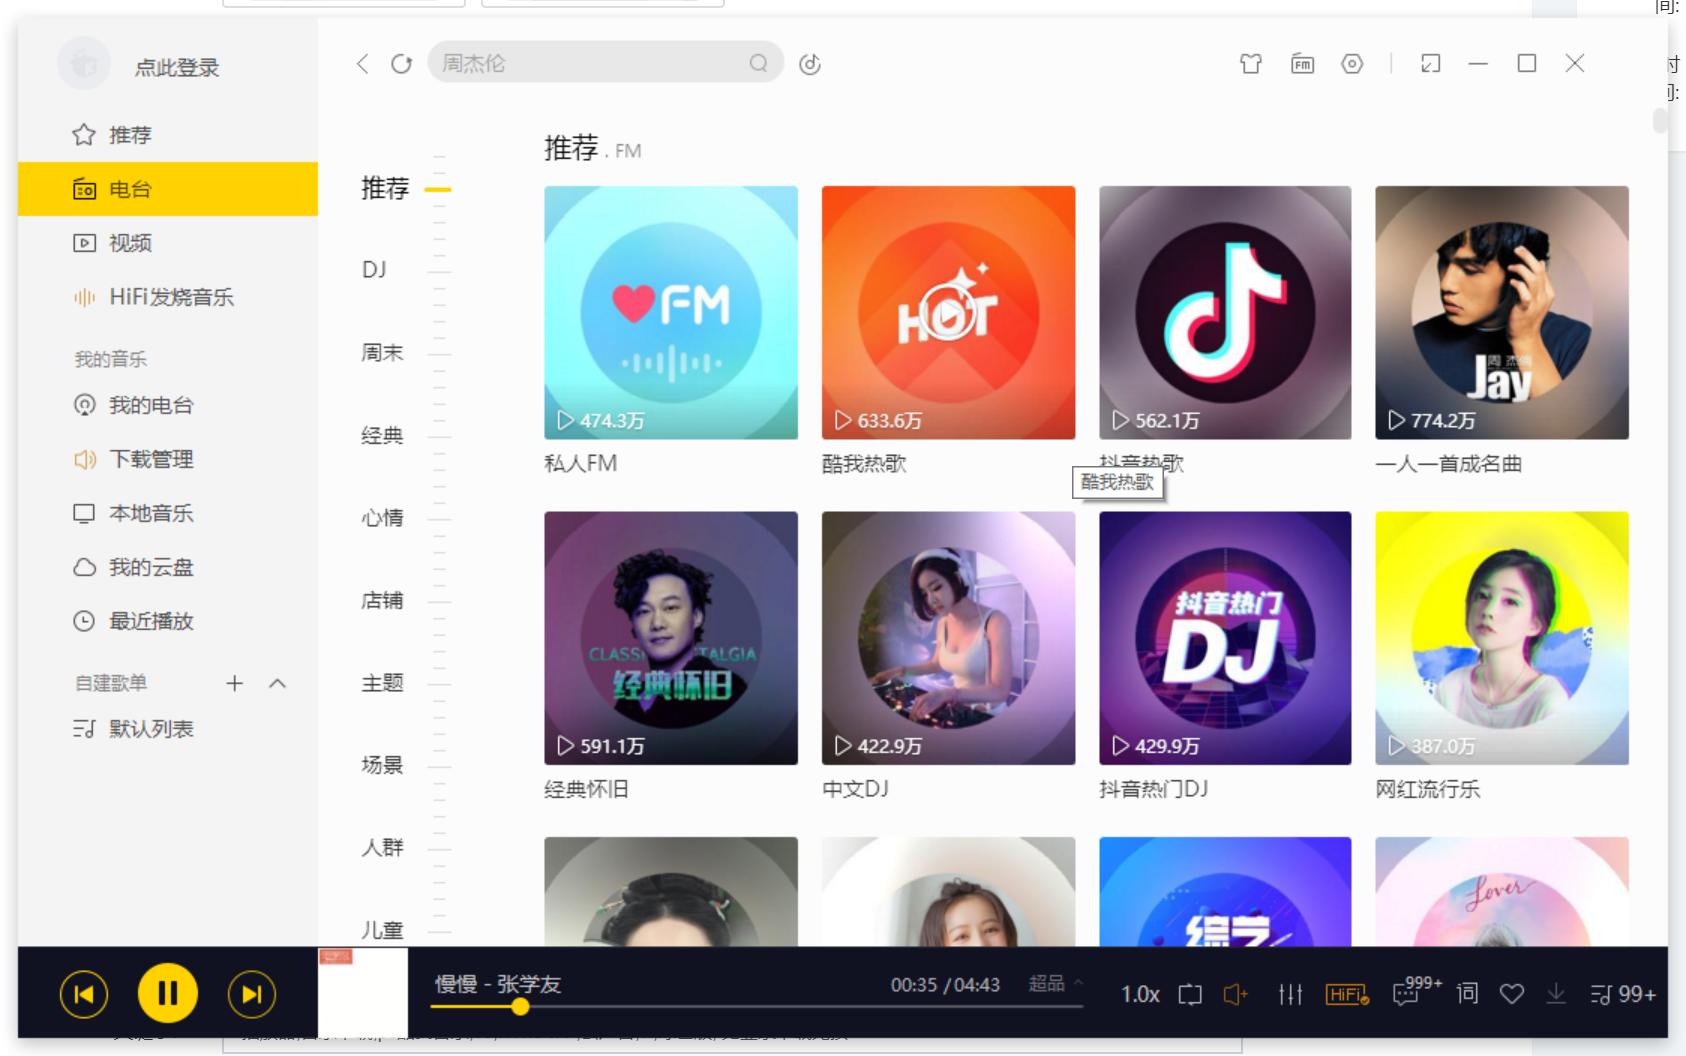 PC酷我音乐V9.1.1.0 W1 去广告 VIP绿色版 免登录下载无损